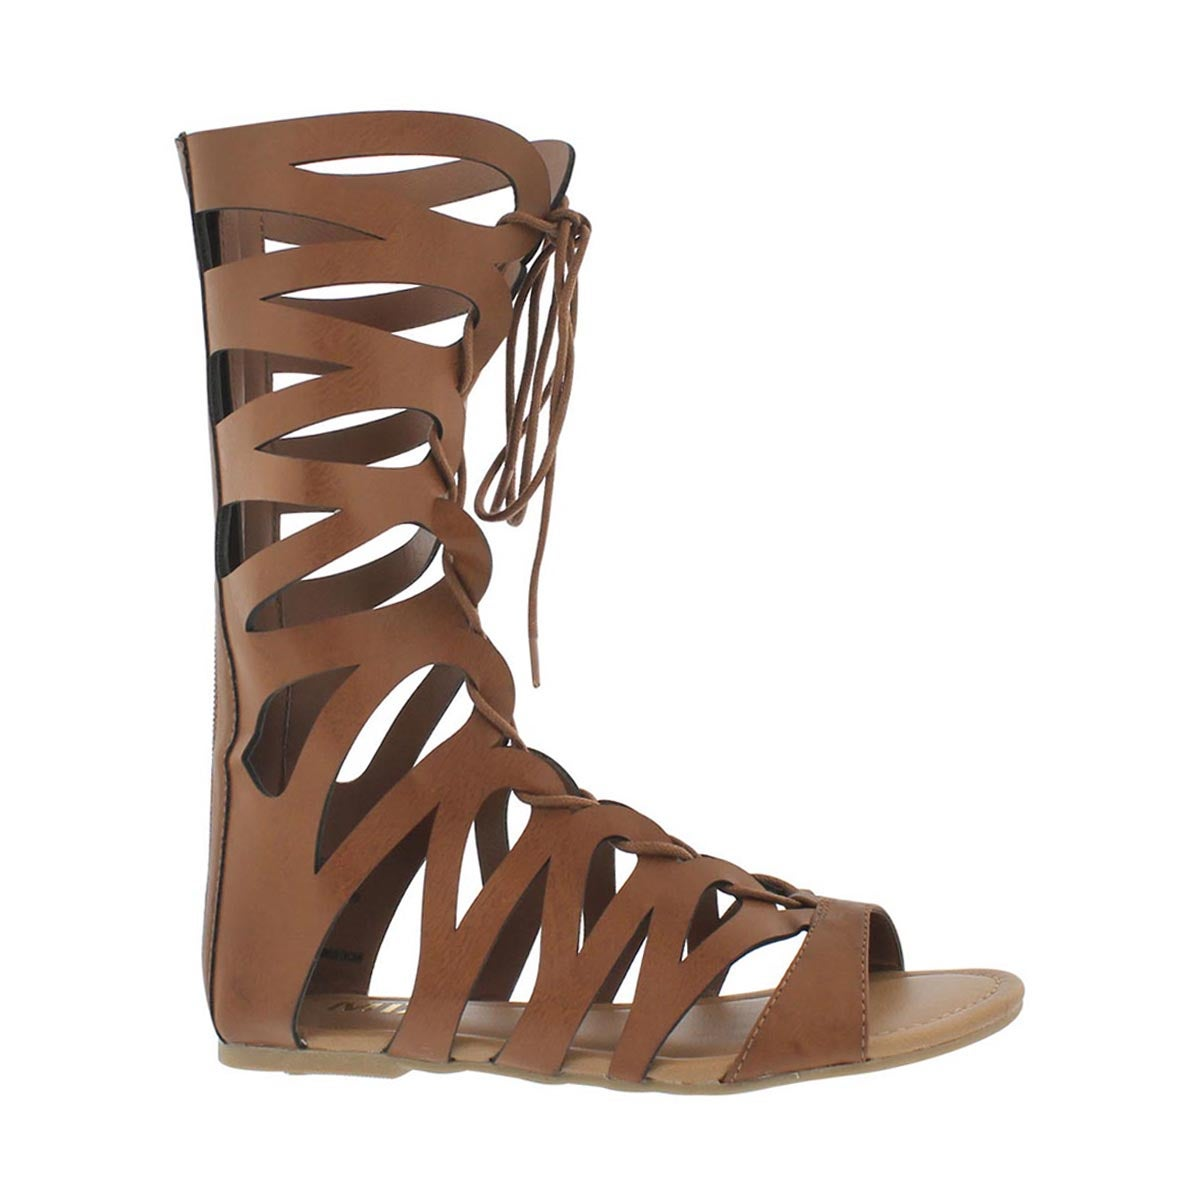 Girls' JANE cognac casual gladiator sandals